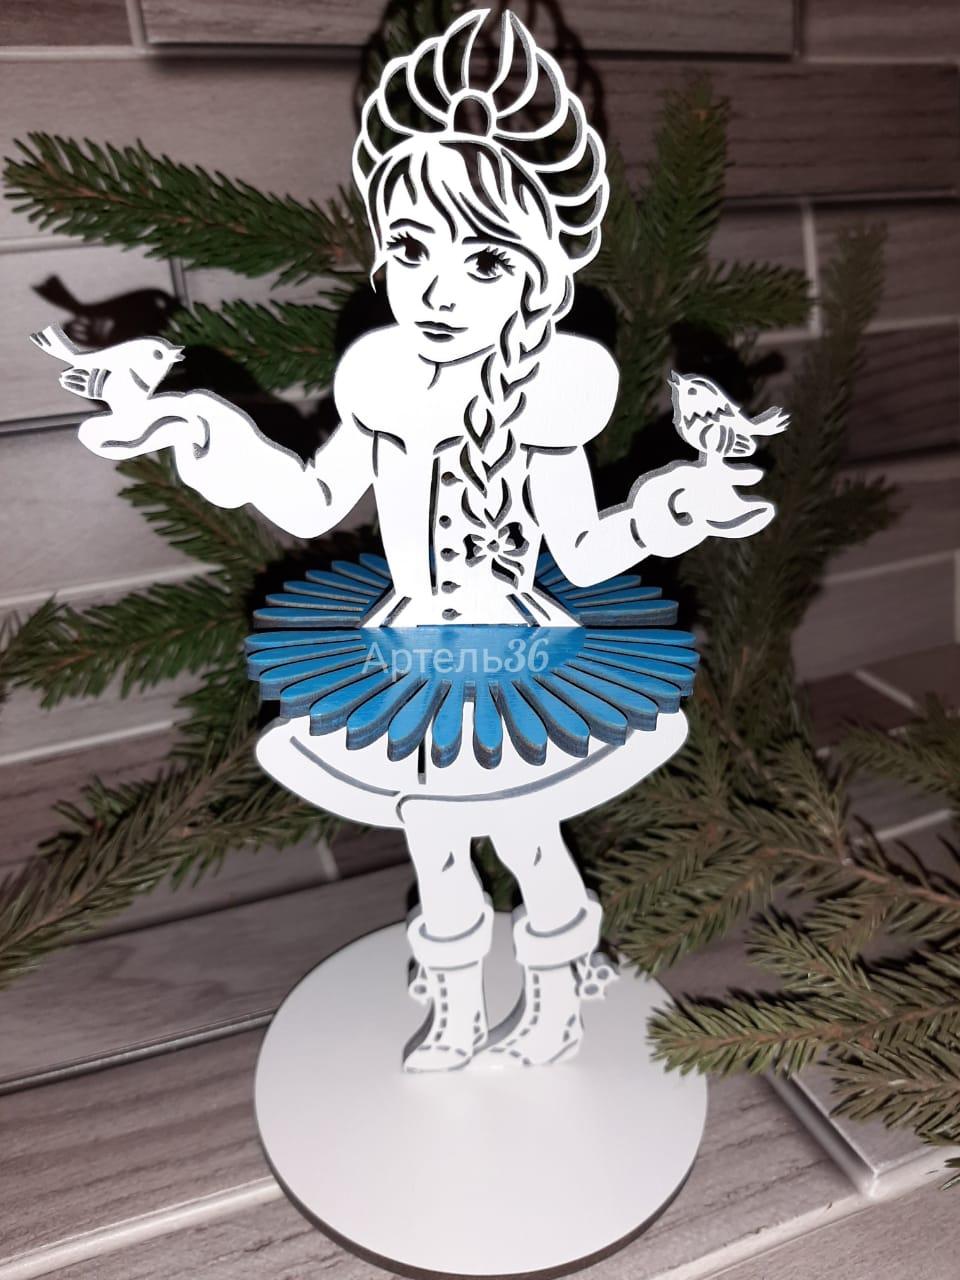 Decorative Wooden Tabletop Snow Maiden Napkin Holder Free CDR Vectors Art